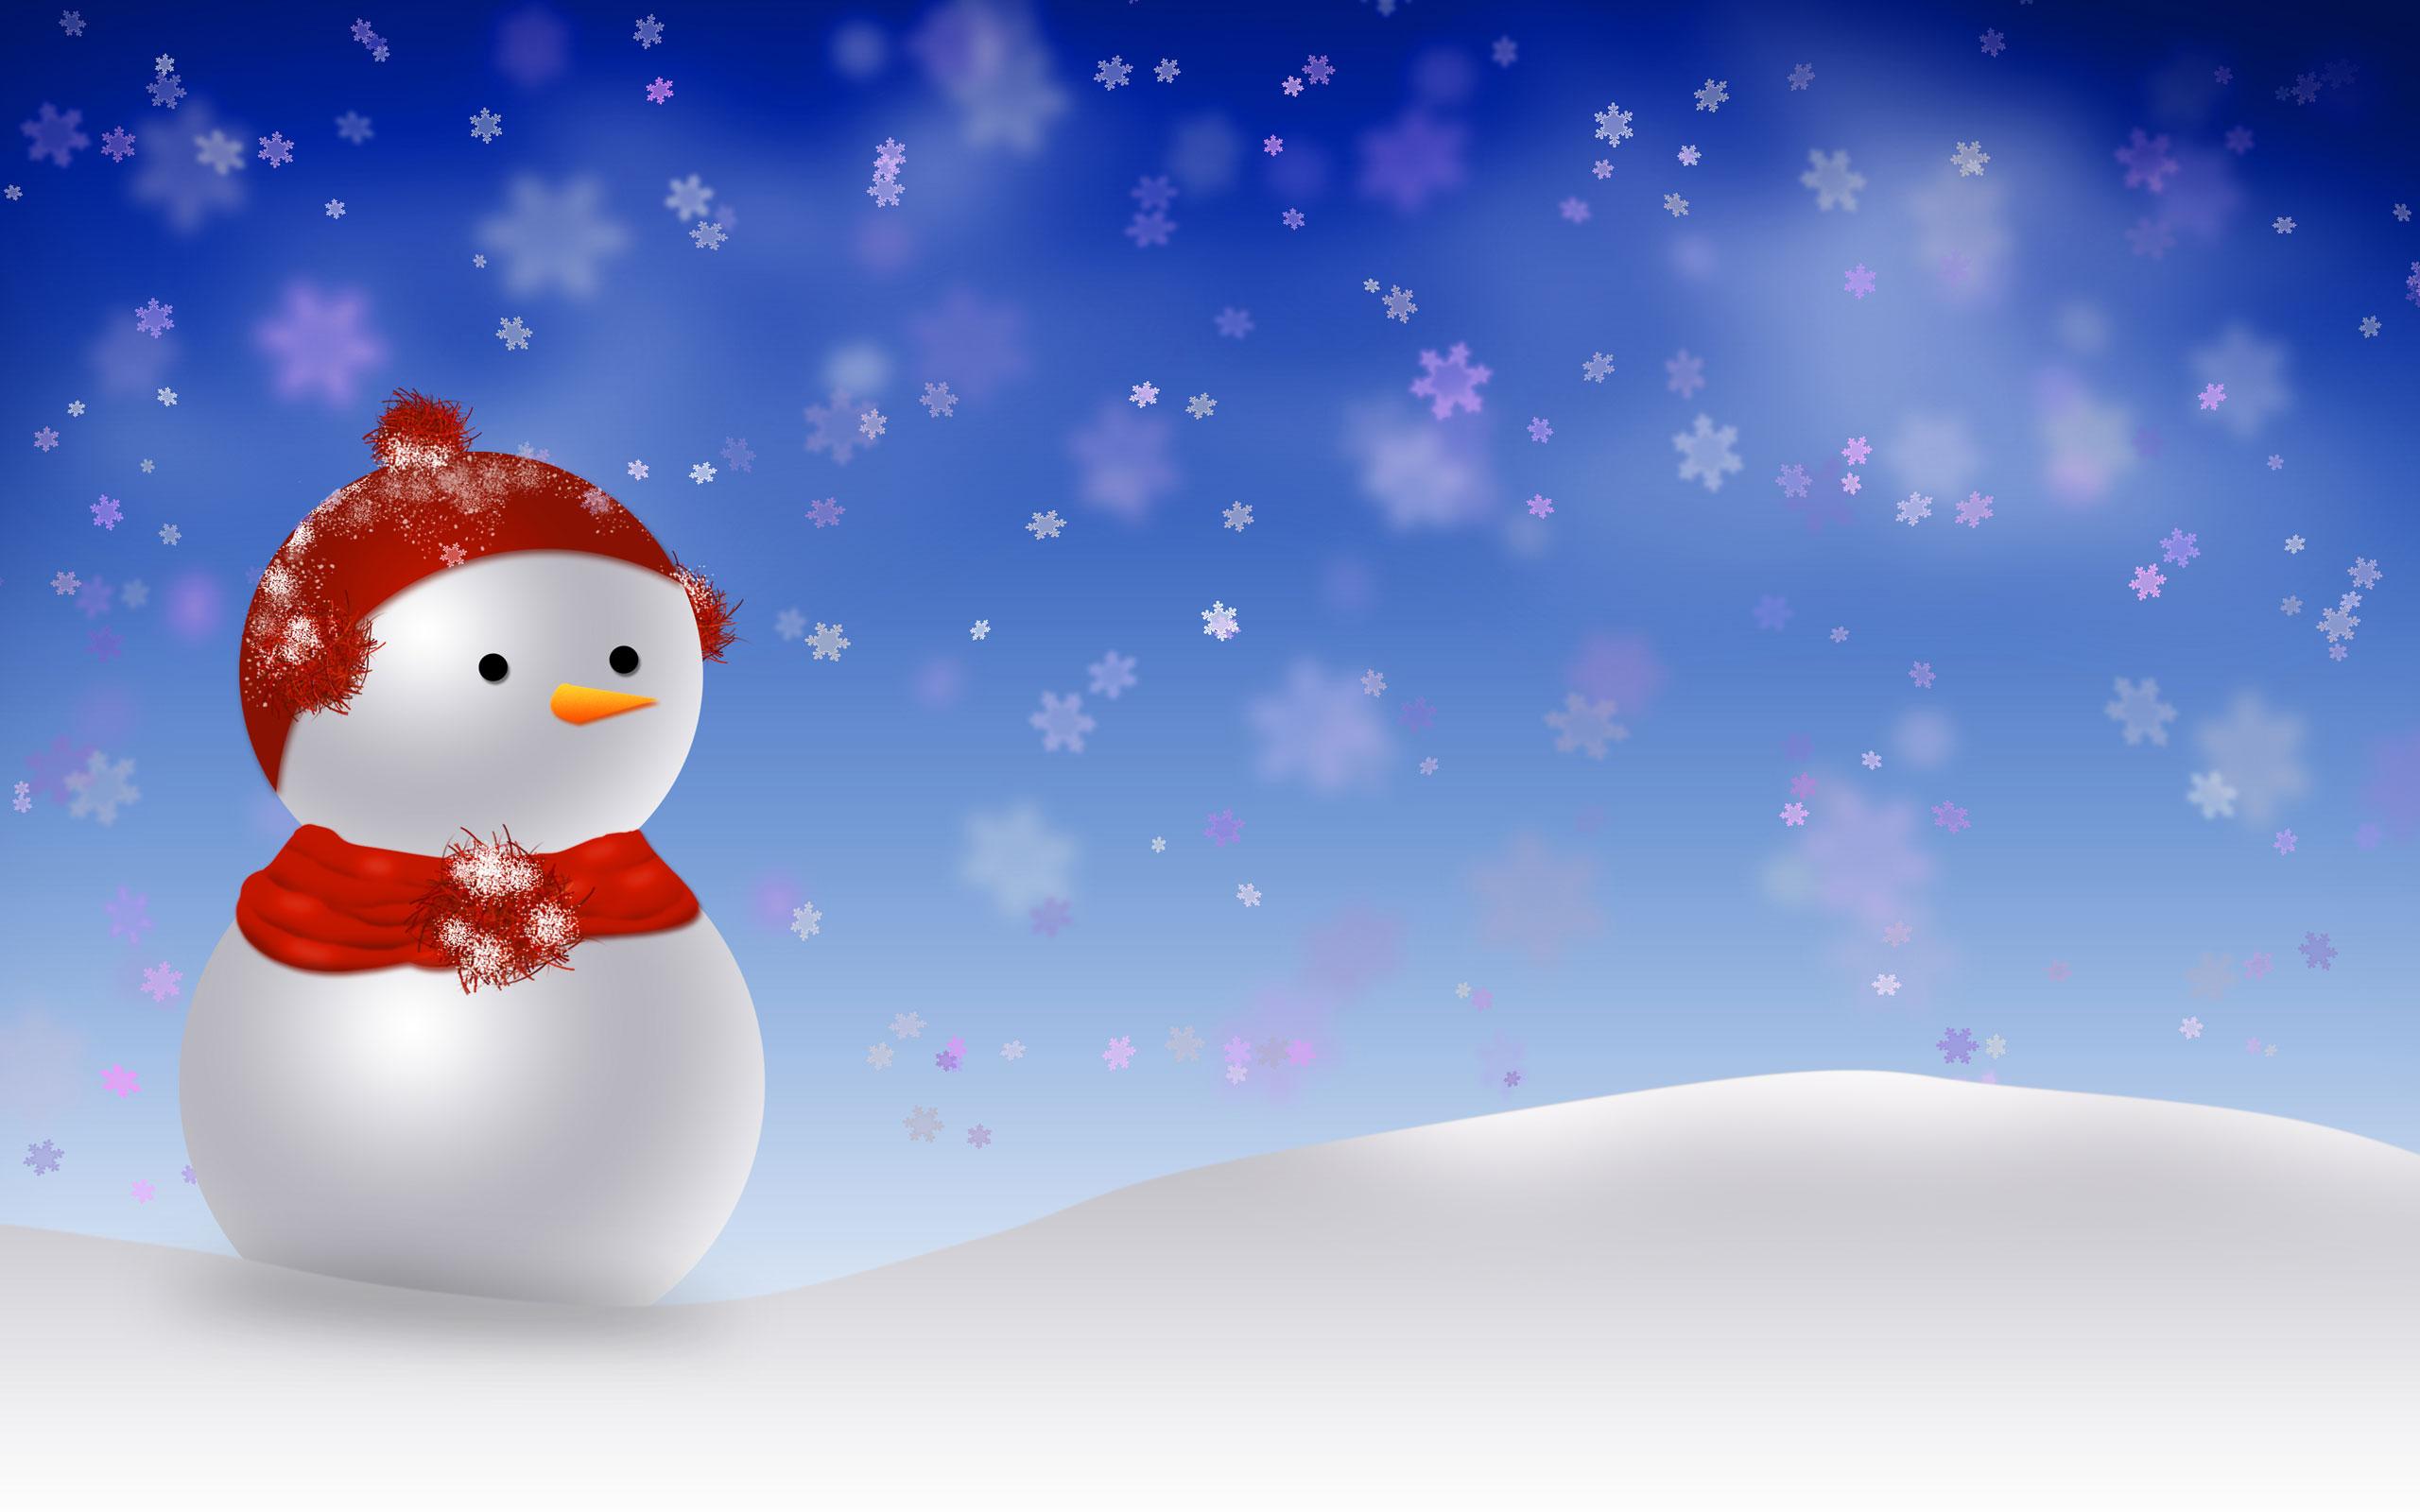 Cute Christmas Backgrounds Cute Christmas Desktop Backgrounds 2560x1600